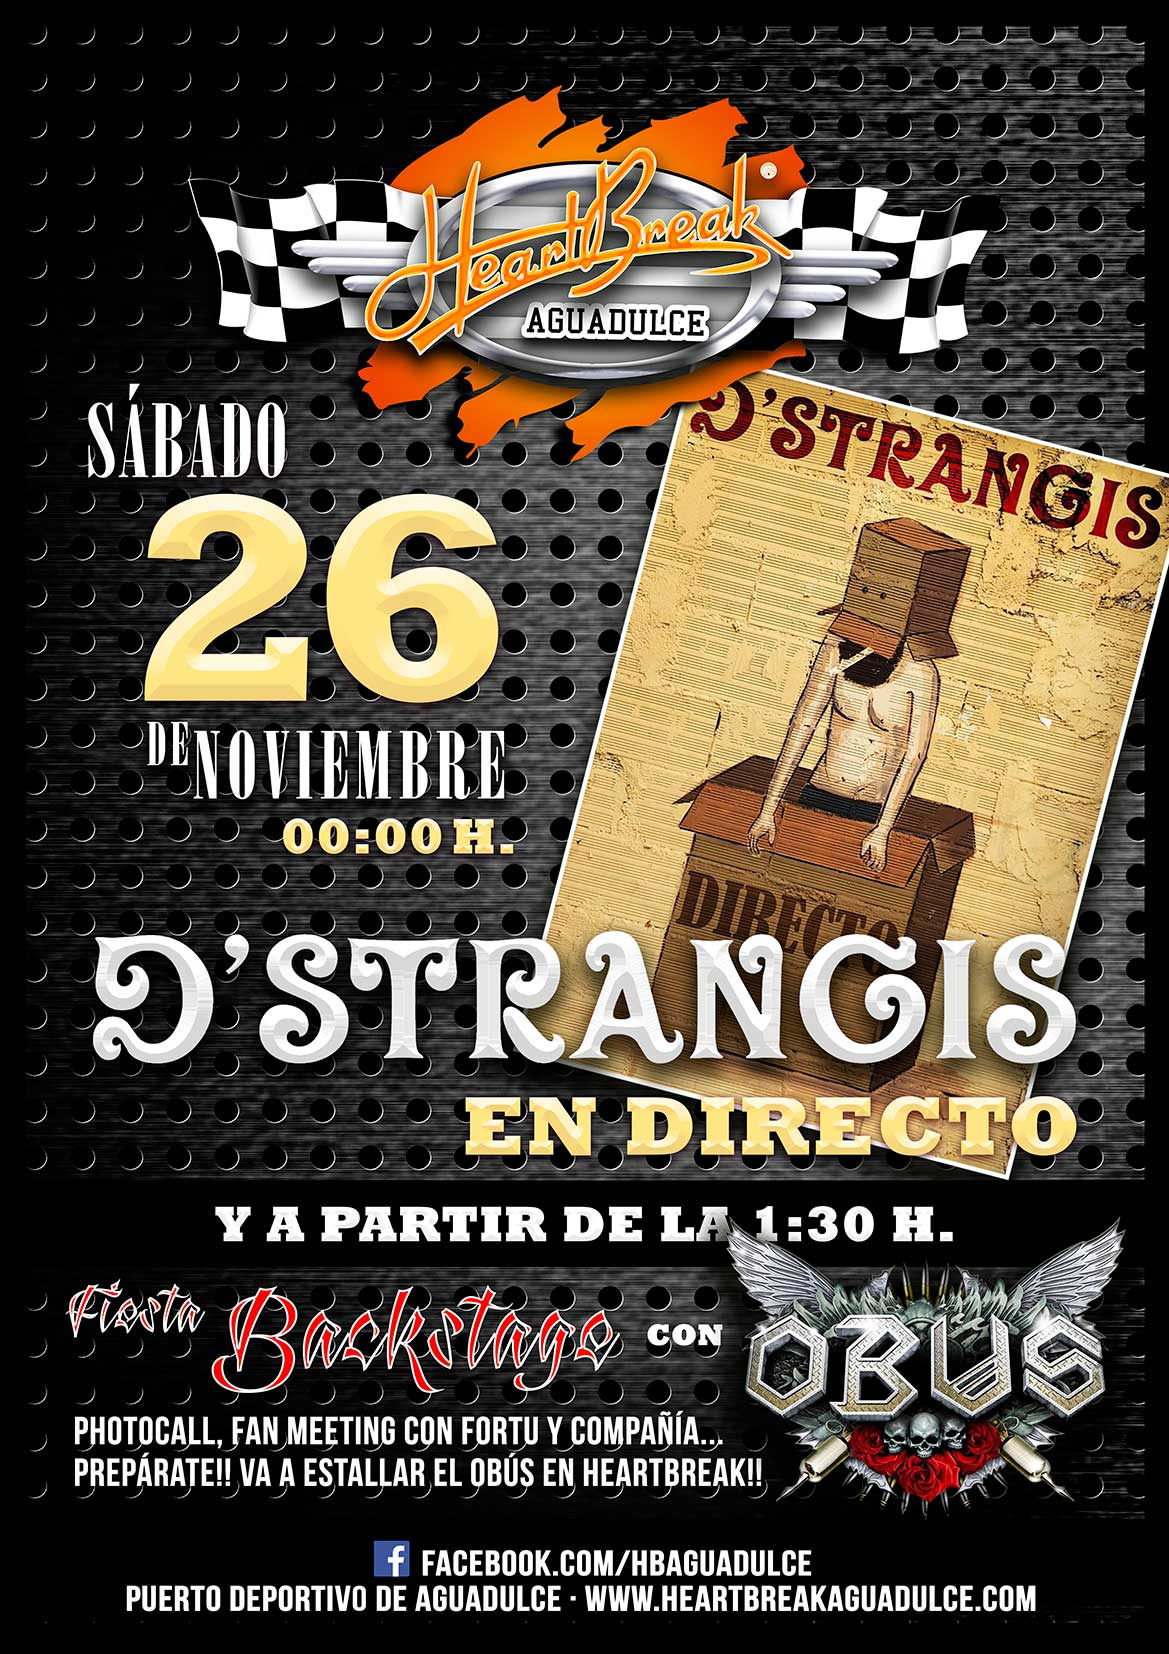 D´strangis y Fiesta Backstage